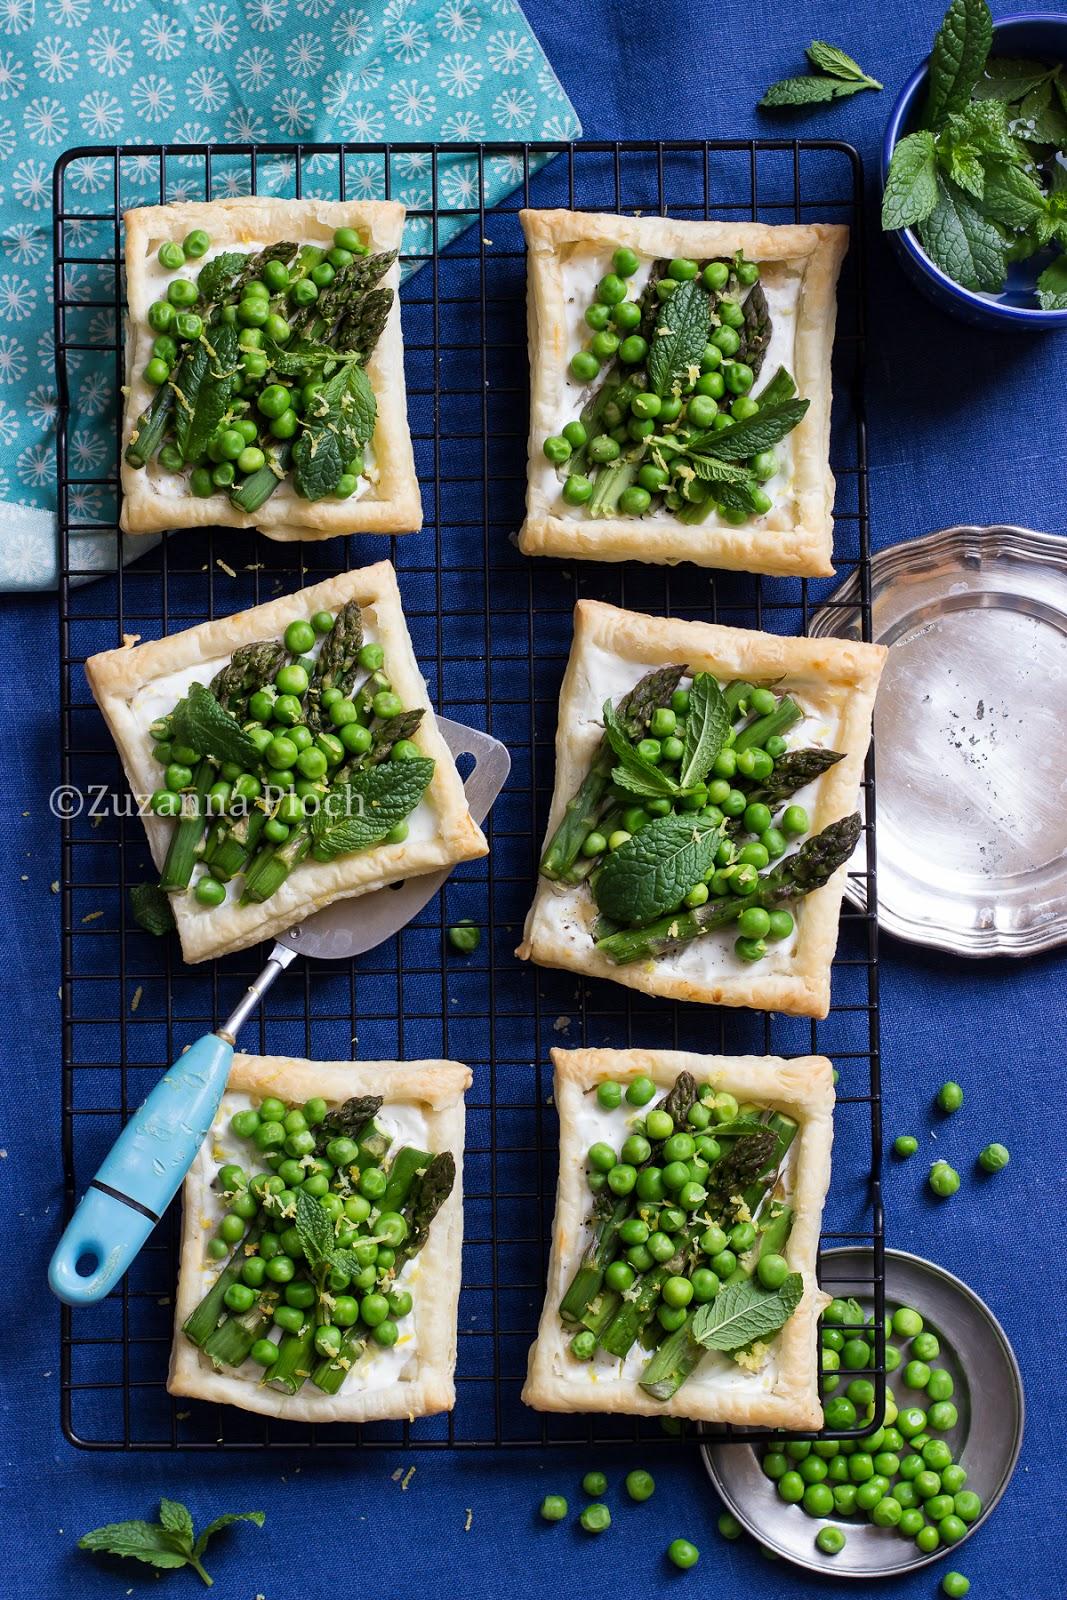 Asparagus pea tarts - food photgraphy by Zuzanna Ploch, fotografia kulinarna